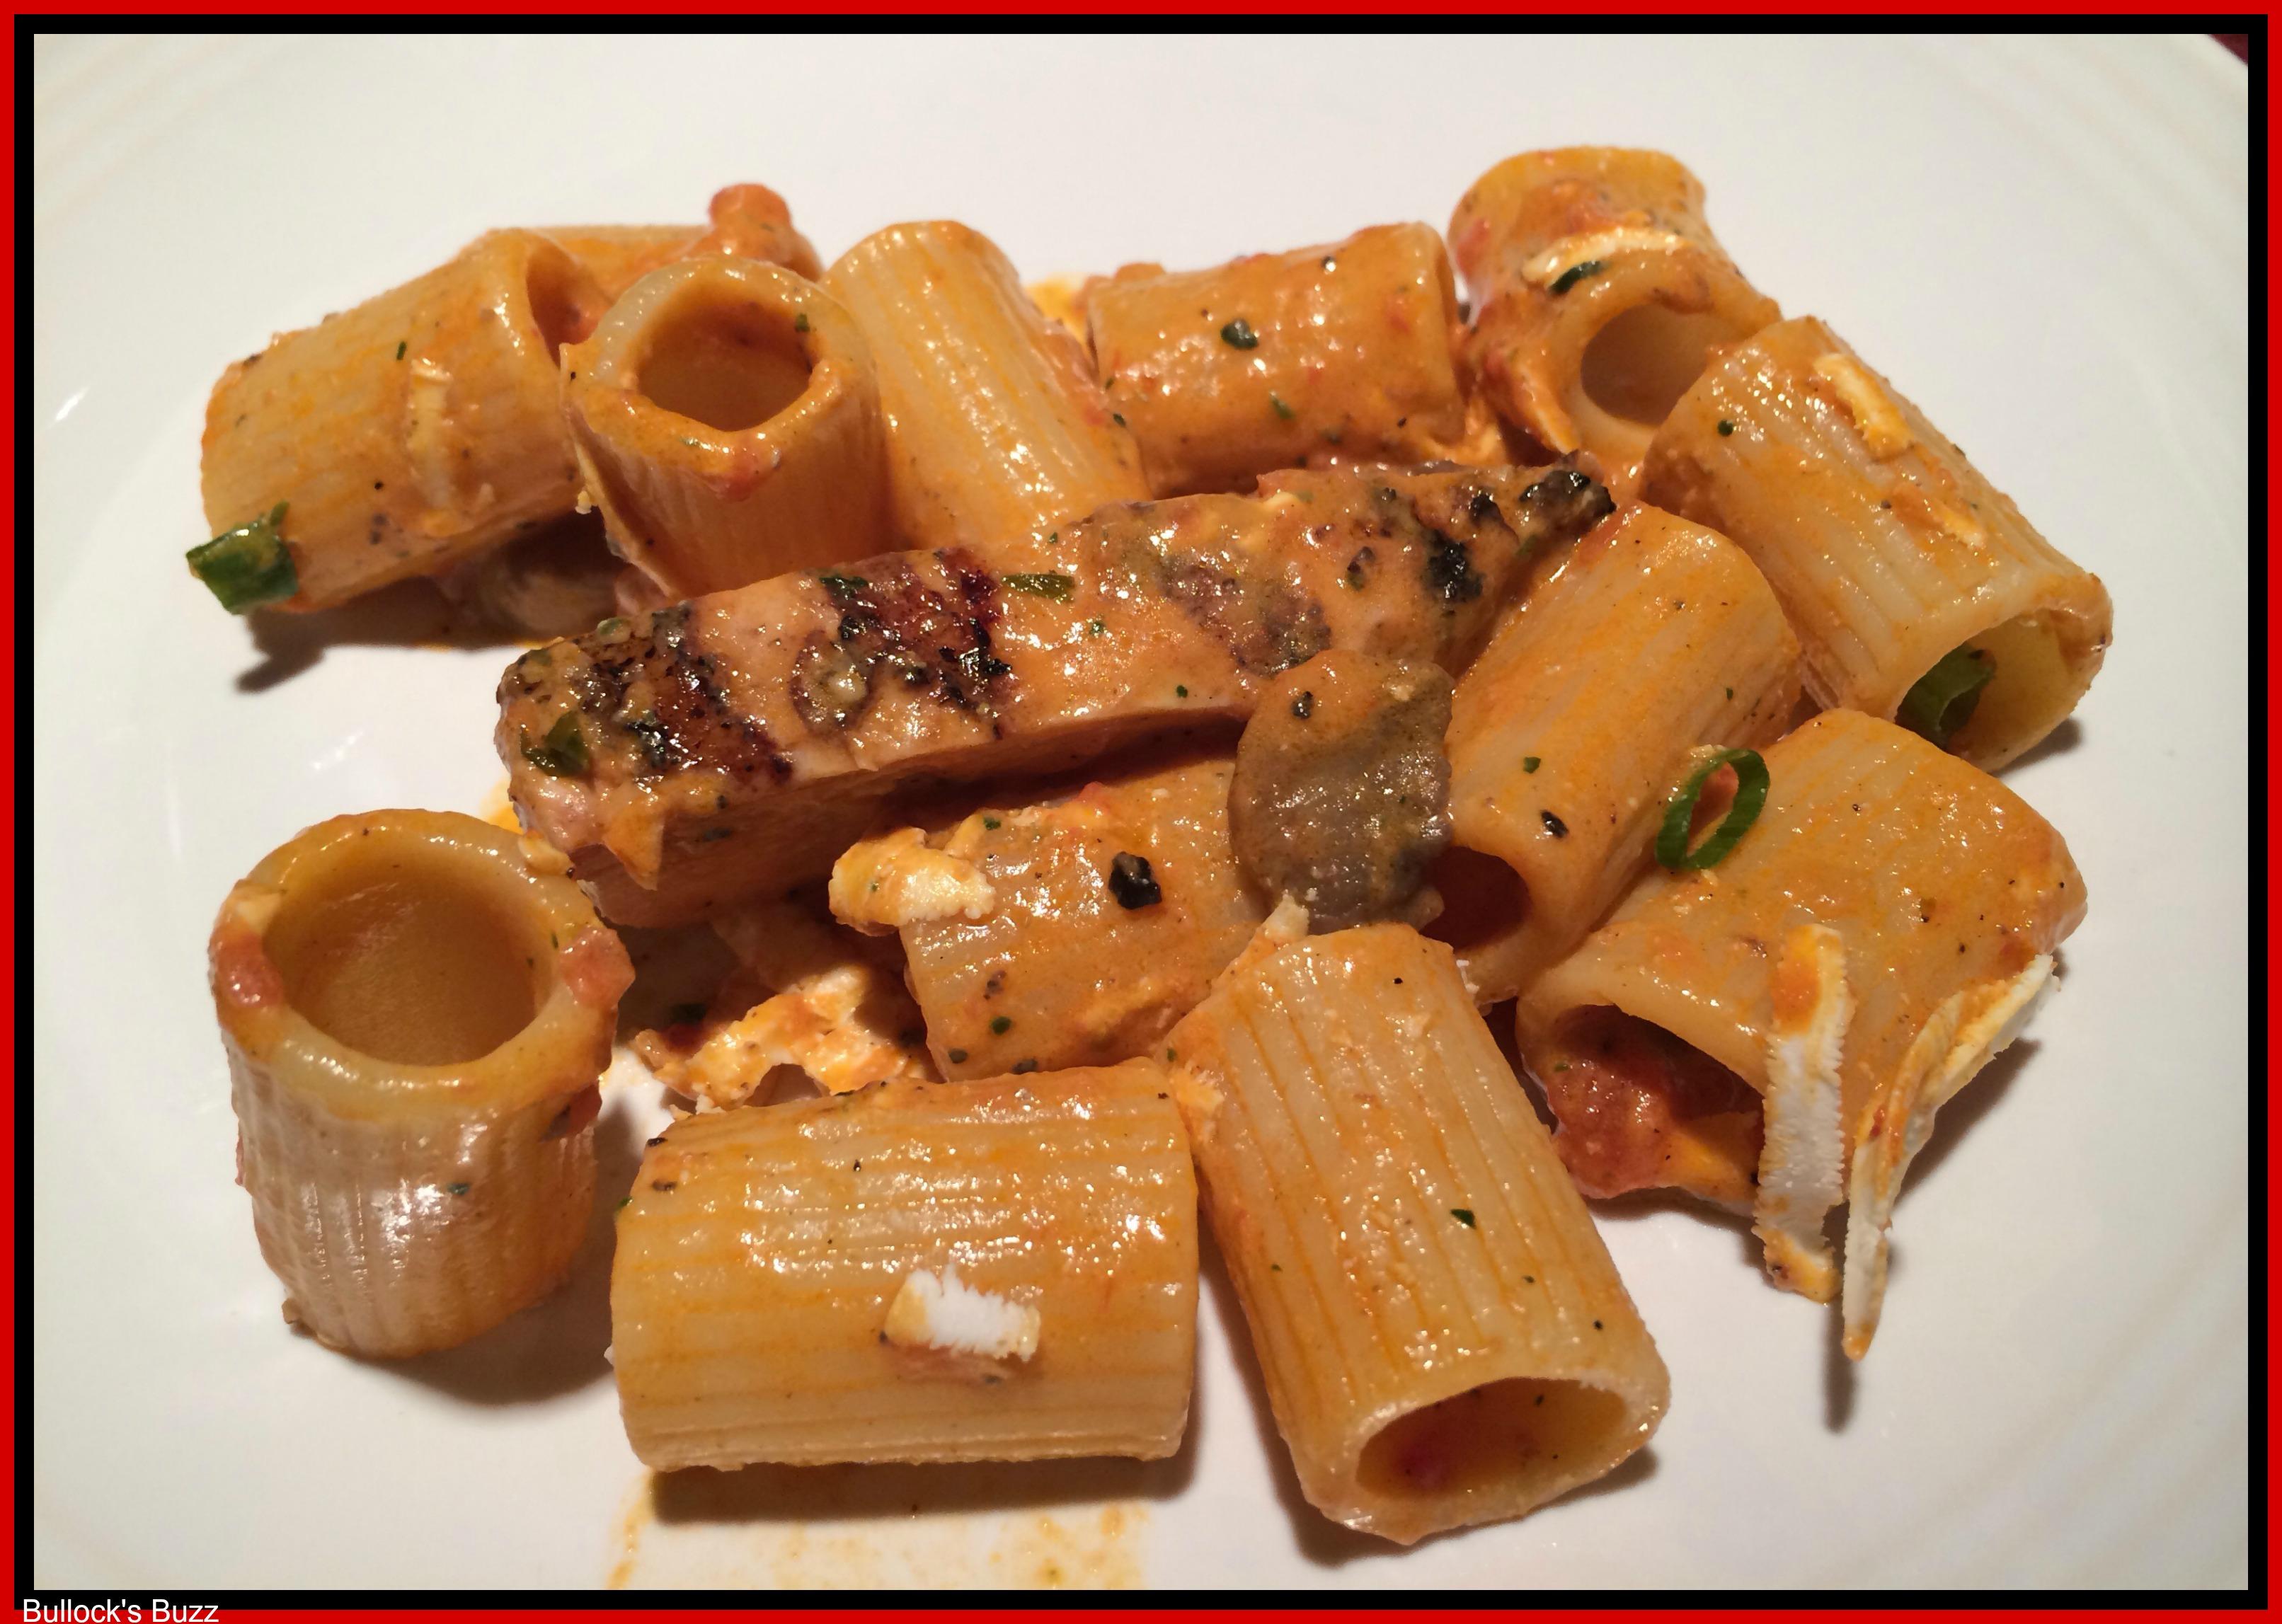 photograph relating to Carrabba's Printable Menu identify Carrabbas Refreshing Menu Italian Values - Around 15 Contemporary Merchandise for